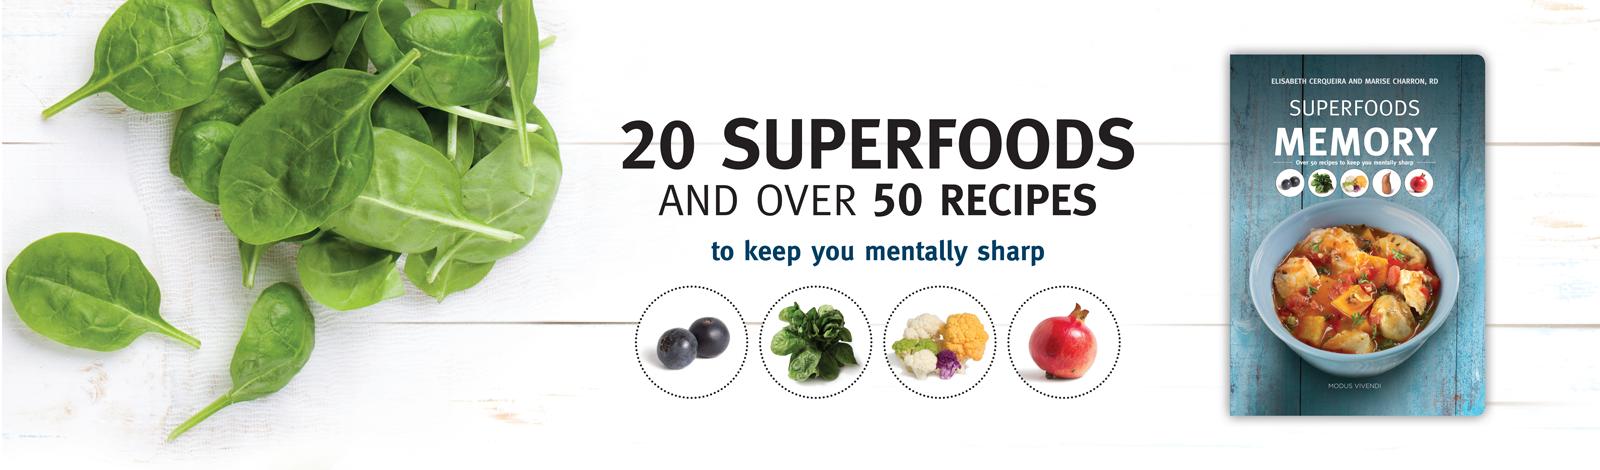 Superfoods - Memory